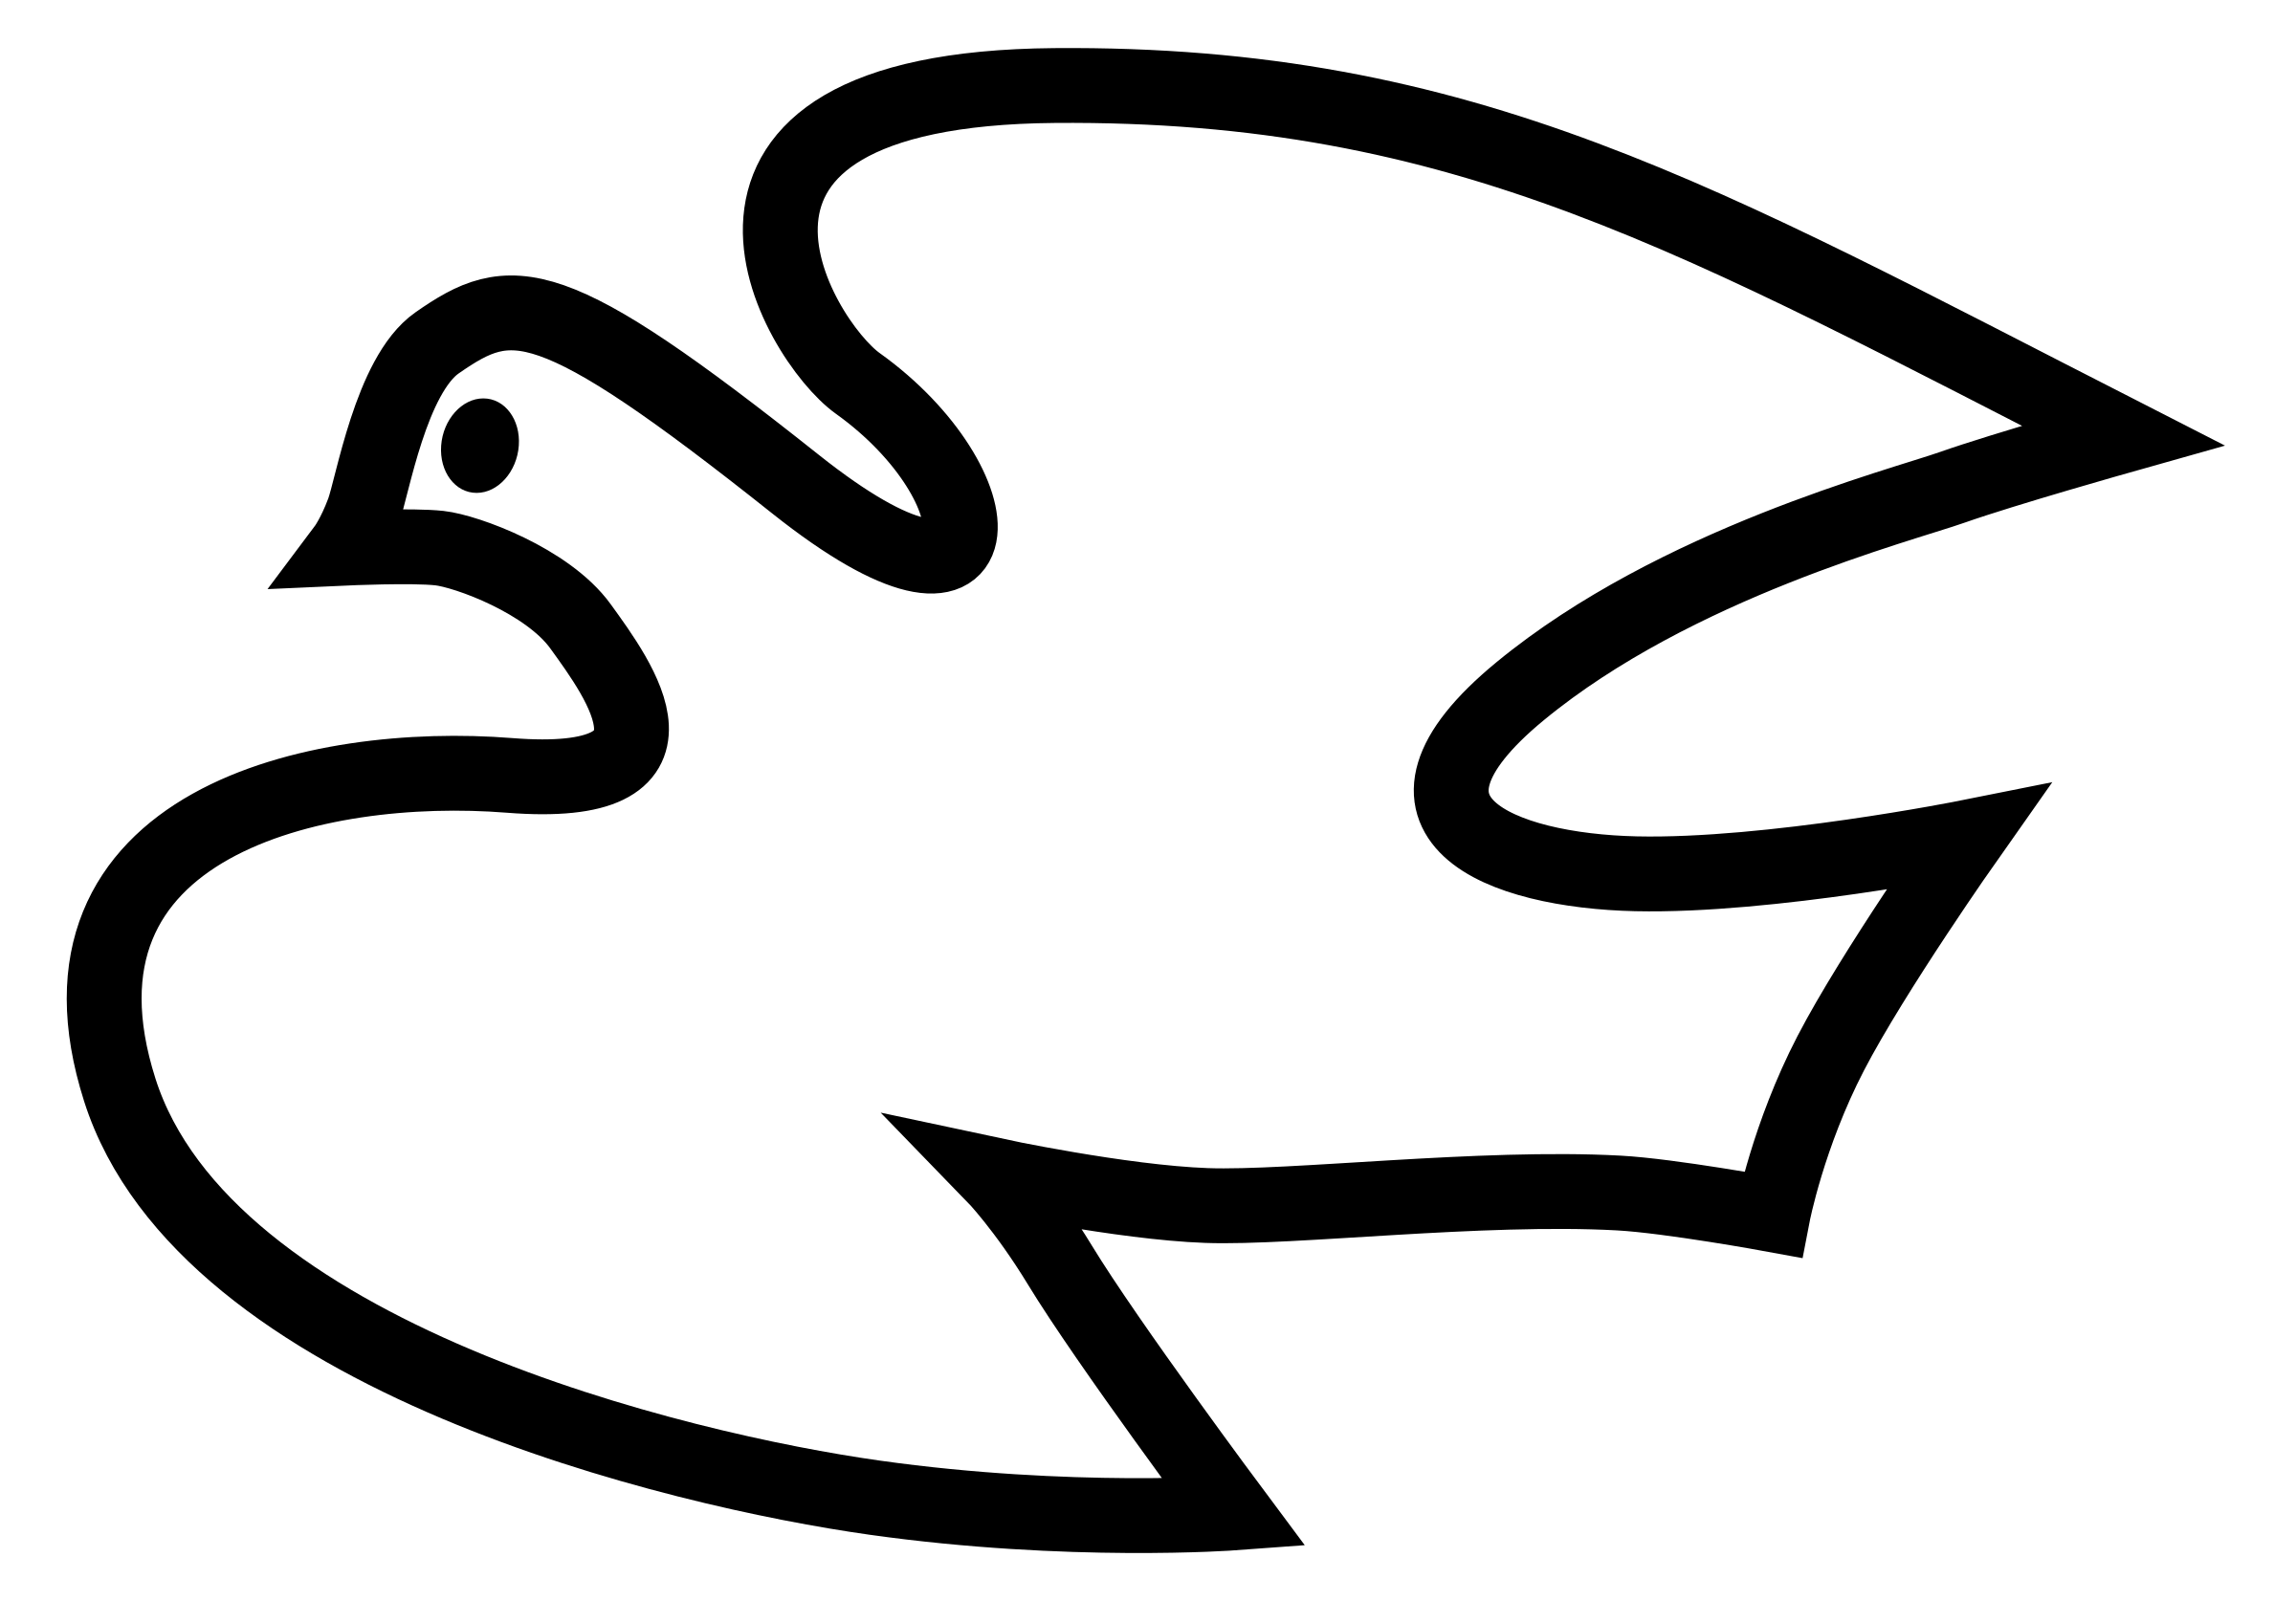 2400x1674 Clipart